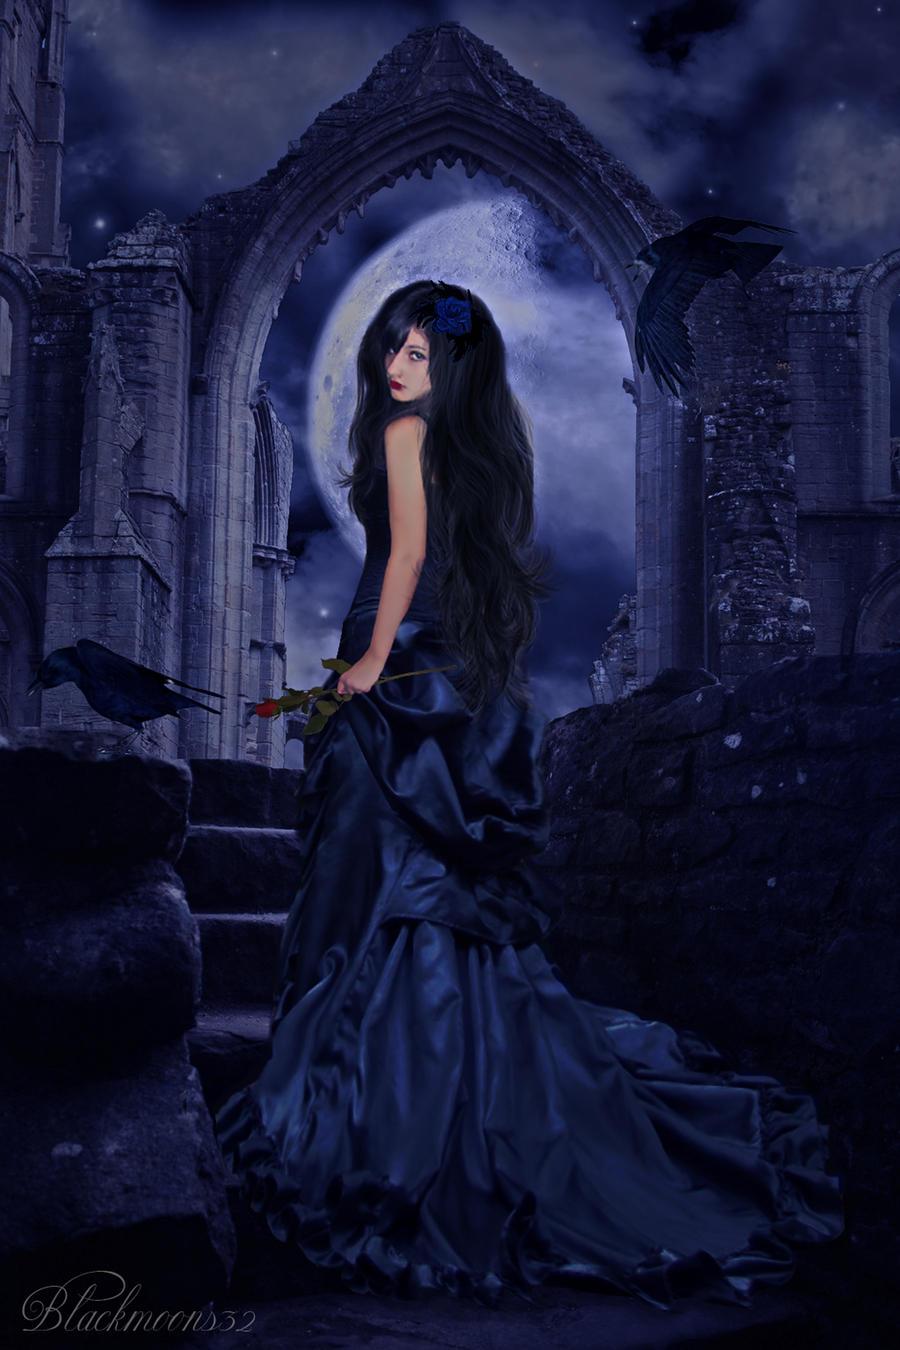 """ Lady moon "" by Blackmoons32 on DeviantArt"